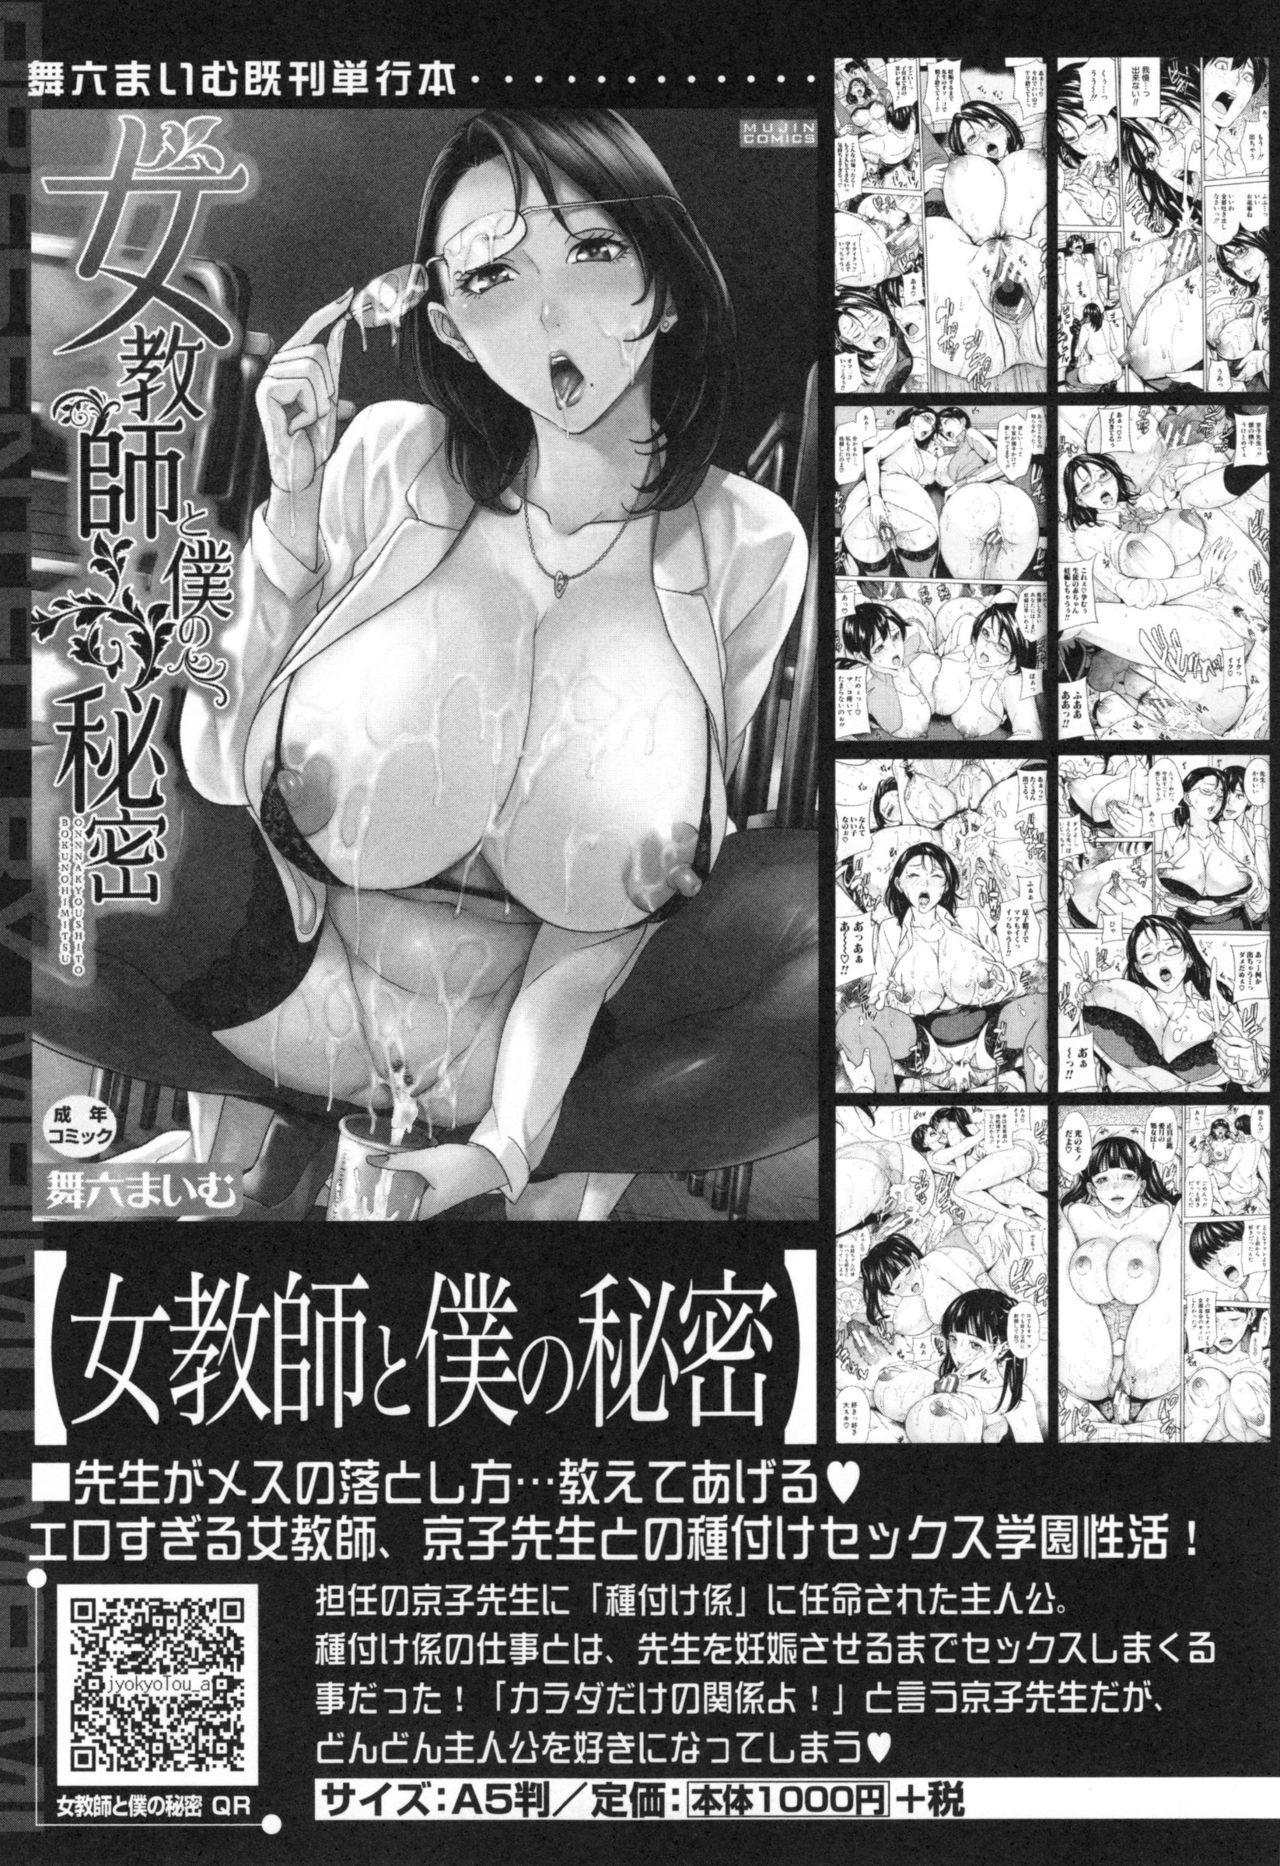 [Maimu-Maimu] Aniyome Bitch Life | Sister-in-Law Slut Life [English] {Taihen Zombii} 187